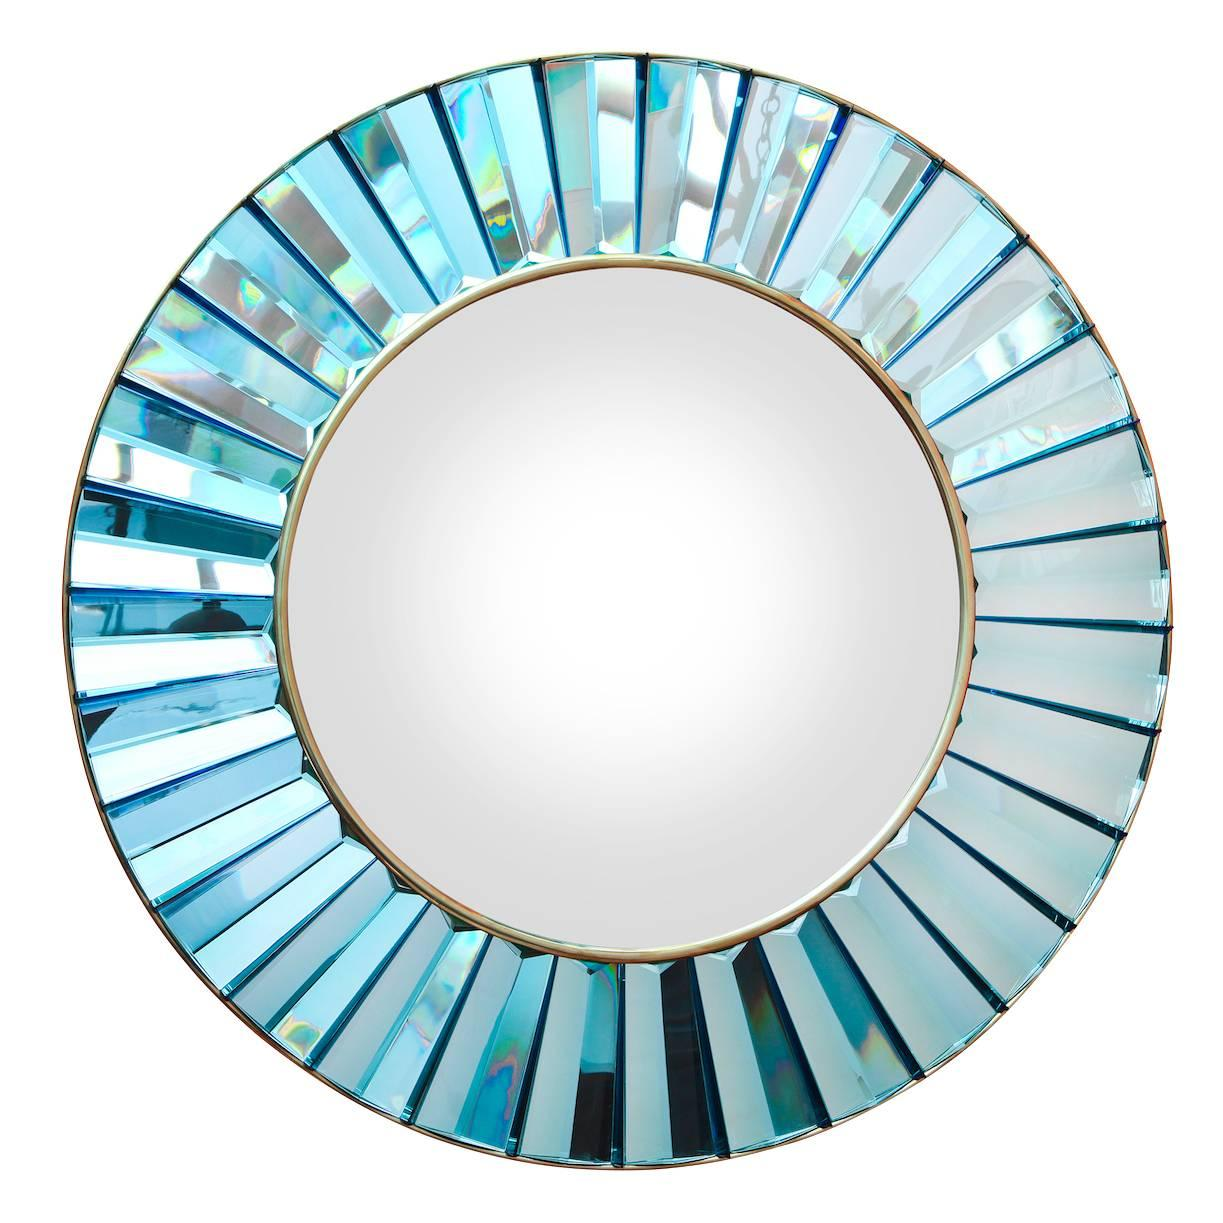 Ghiró Studio Mirror